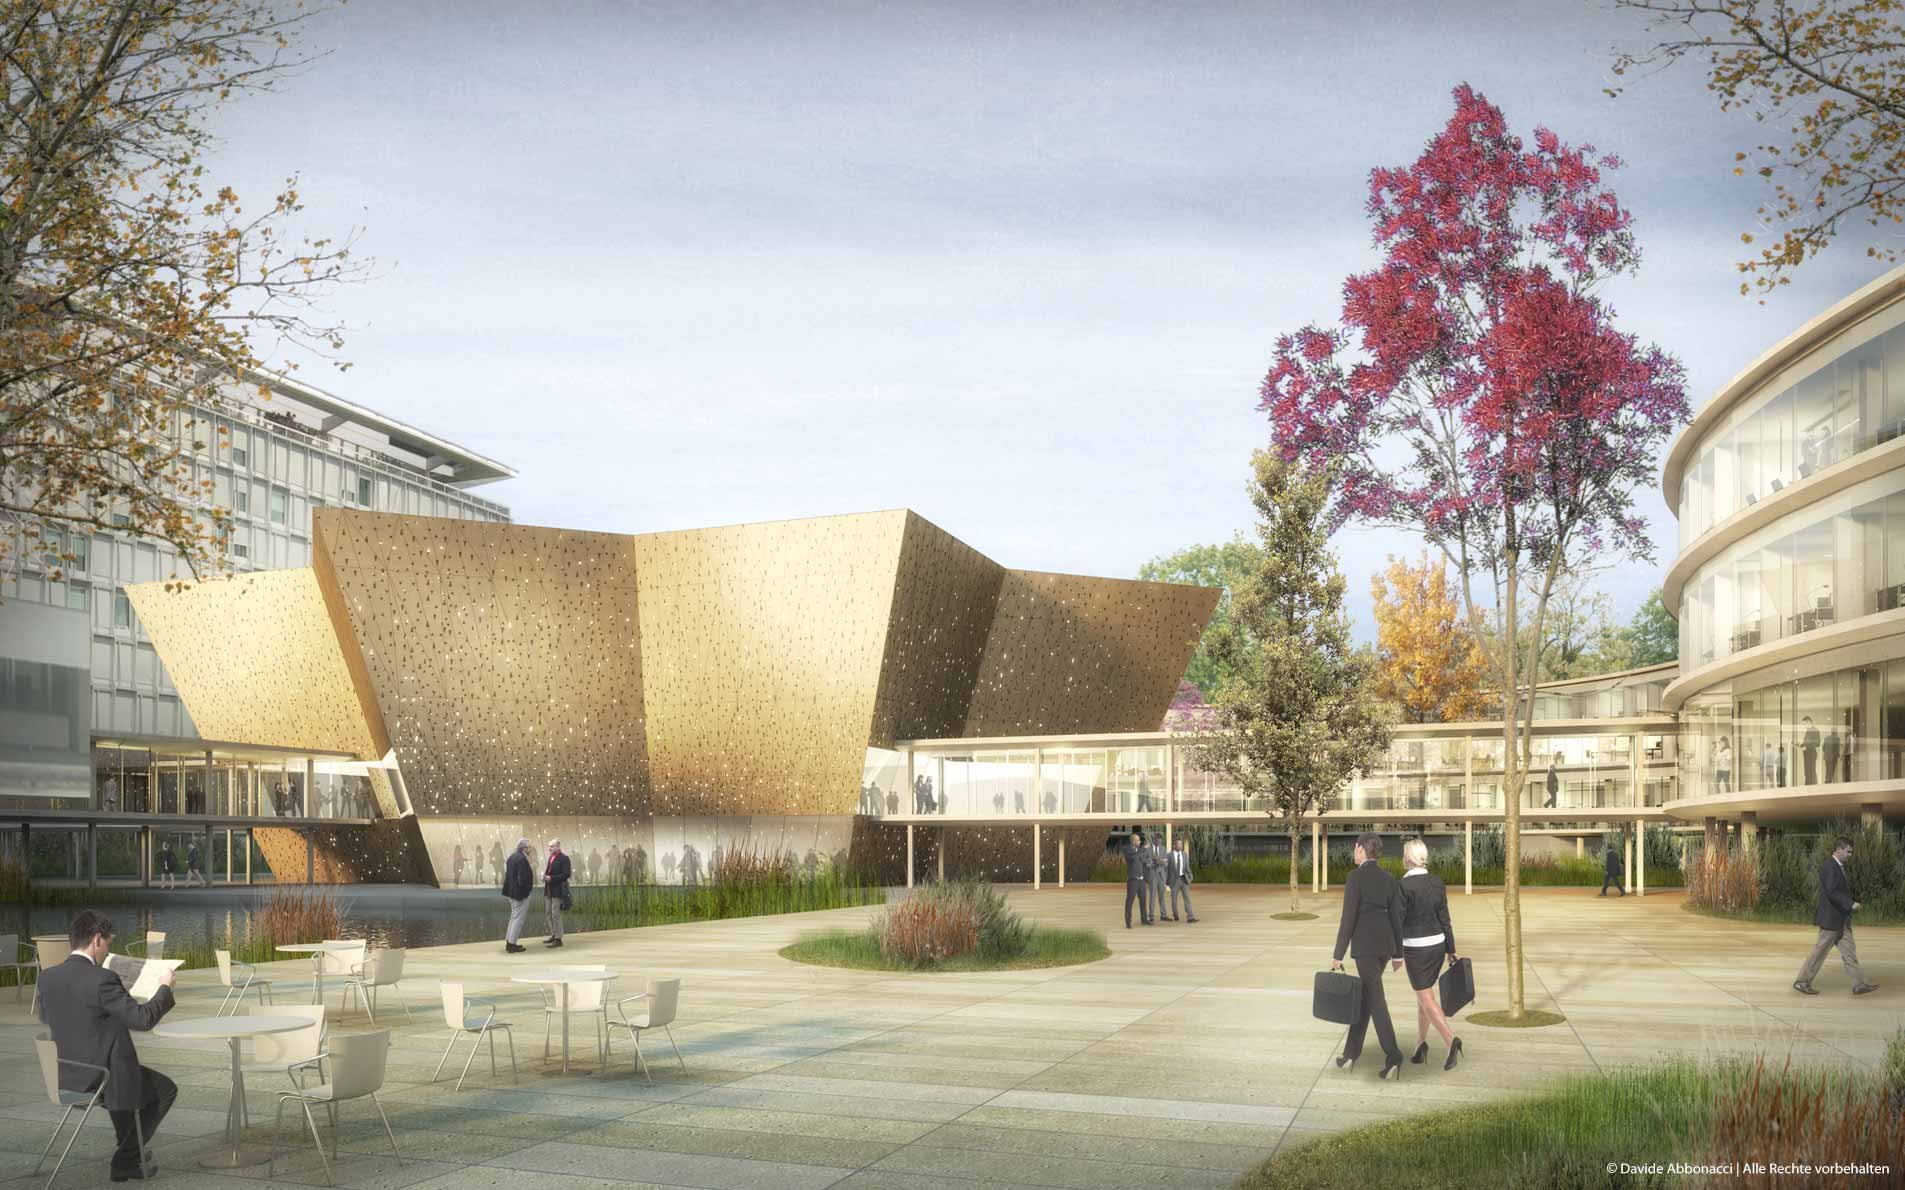 WHO Headquarters Building Extension, Geneva - Switzerland   Adjaye Associates    2014 Wettbewerbsvisualisierung